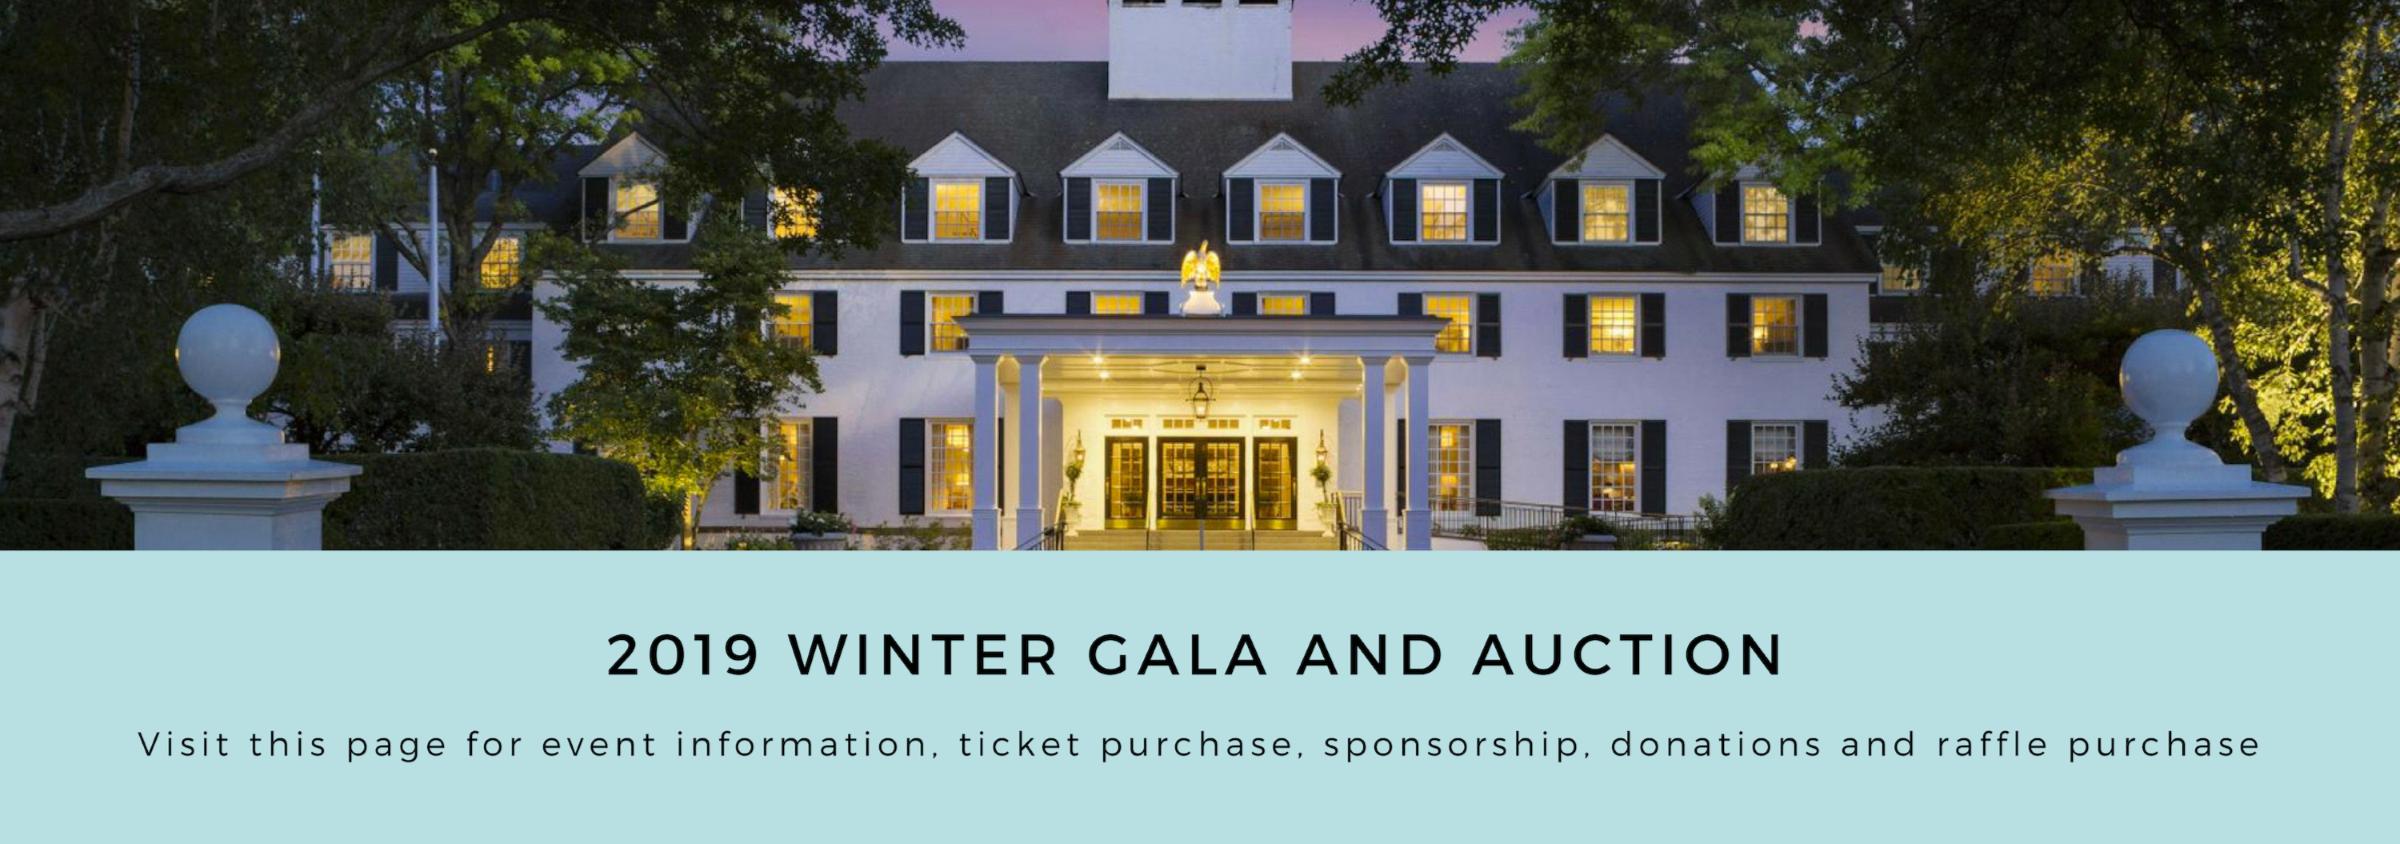 2019 Winter Gala slider image